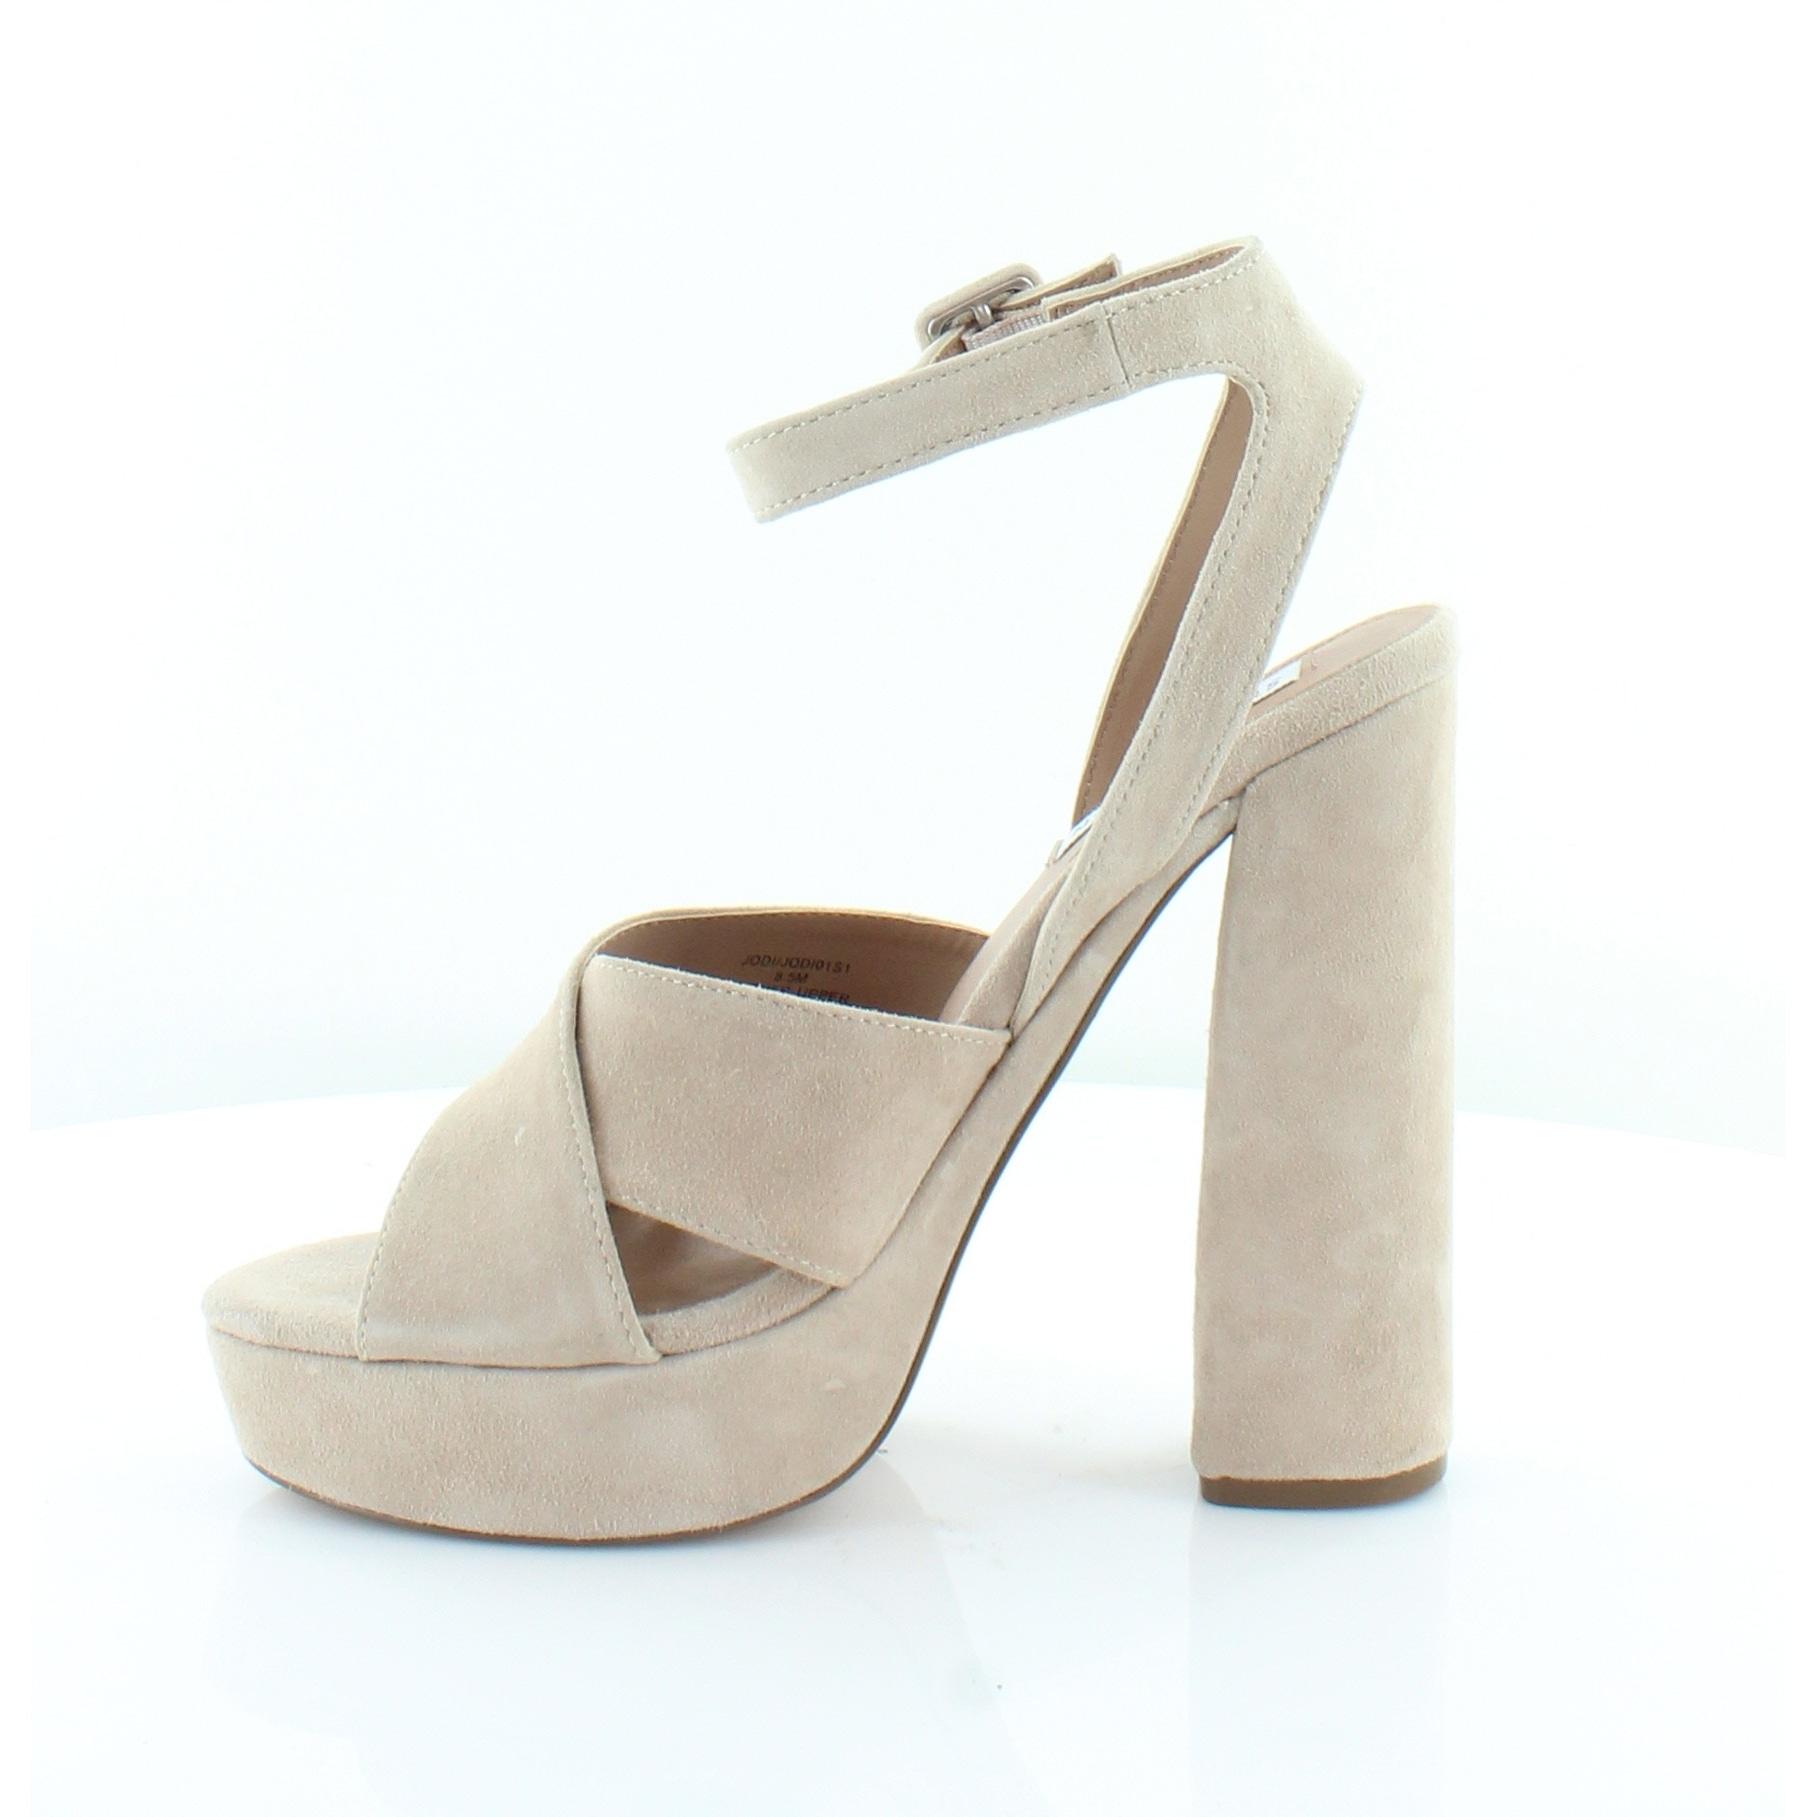 929ae4b5442b4 Shop Steve Madden Jodi Women's Heels Blush - Free Shipping Today -  Overstock - 27345270